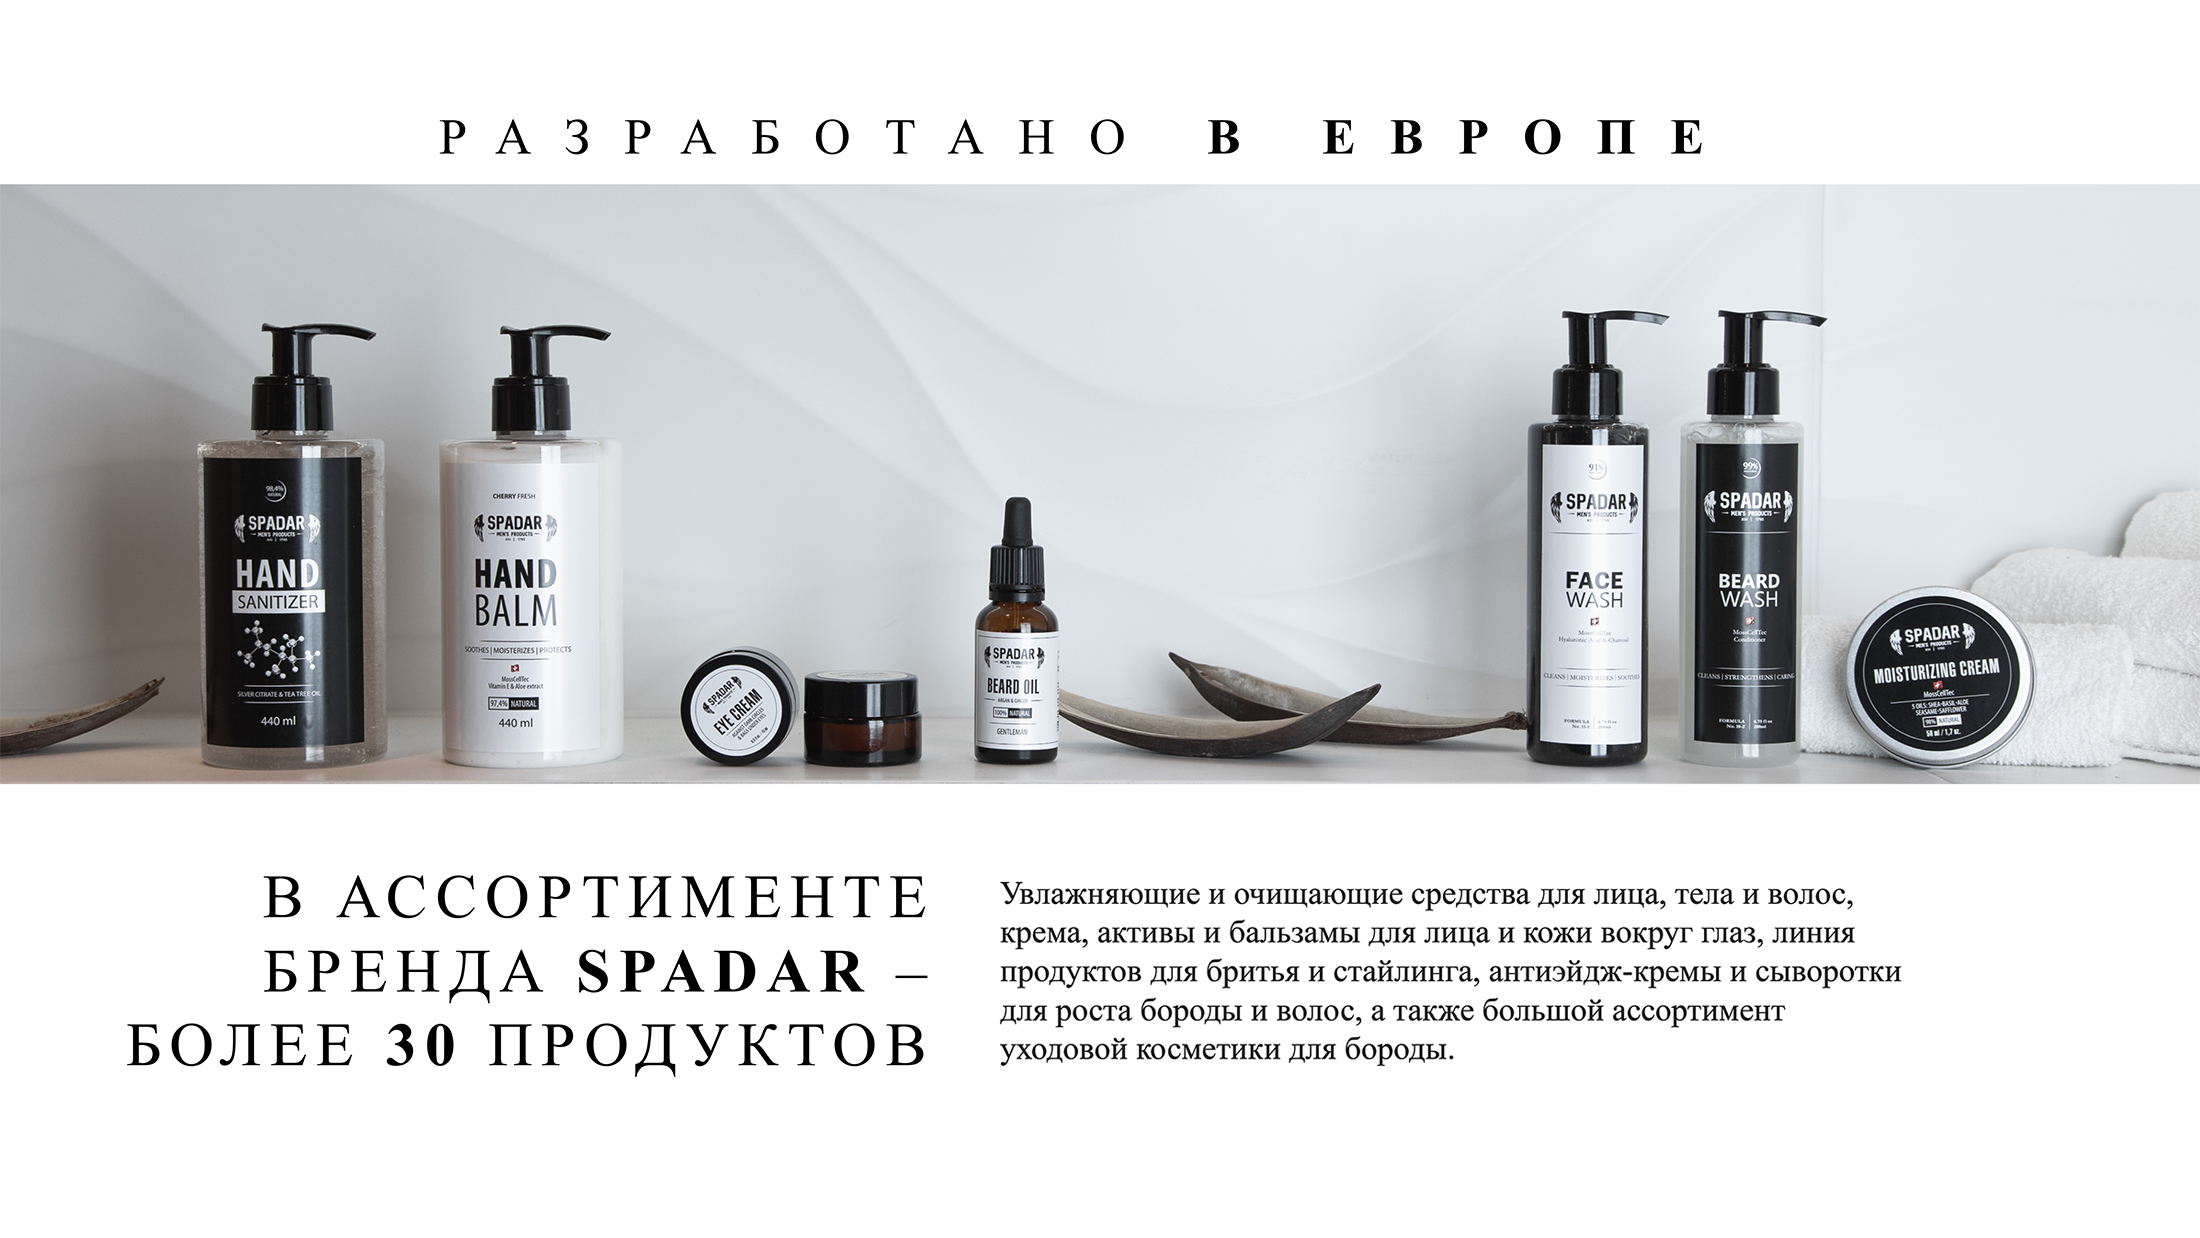 Spadar - более 30 наименований продуктов